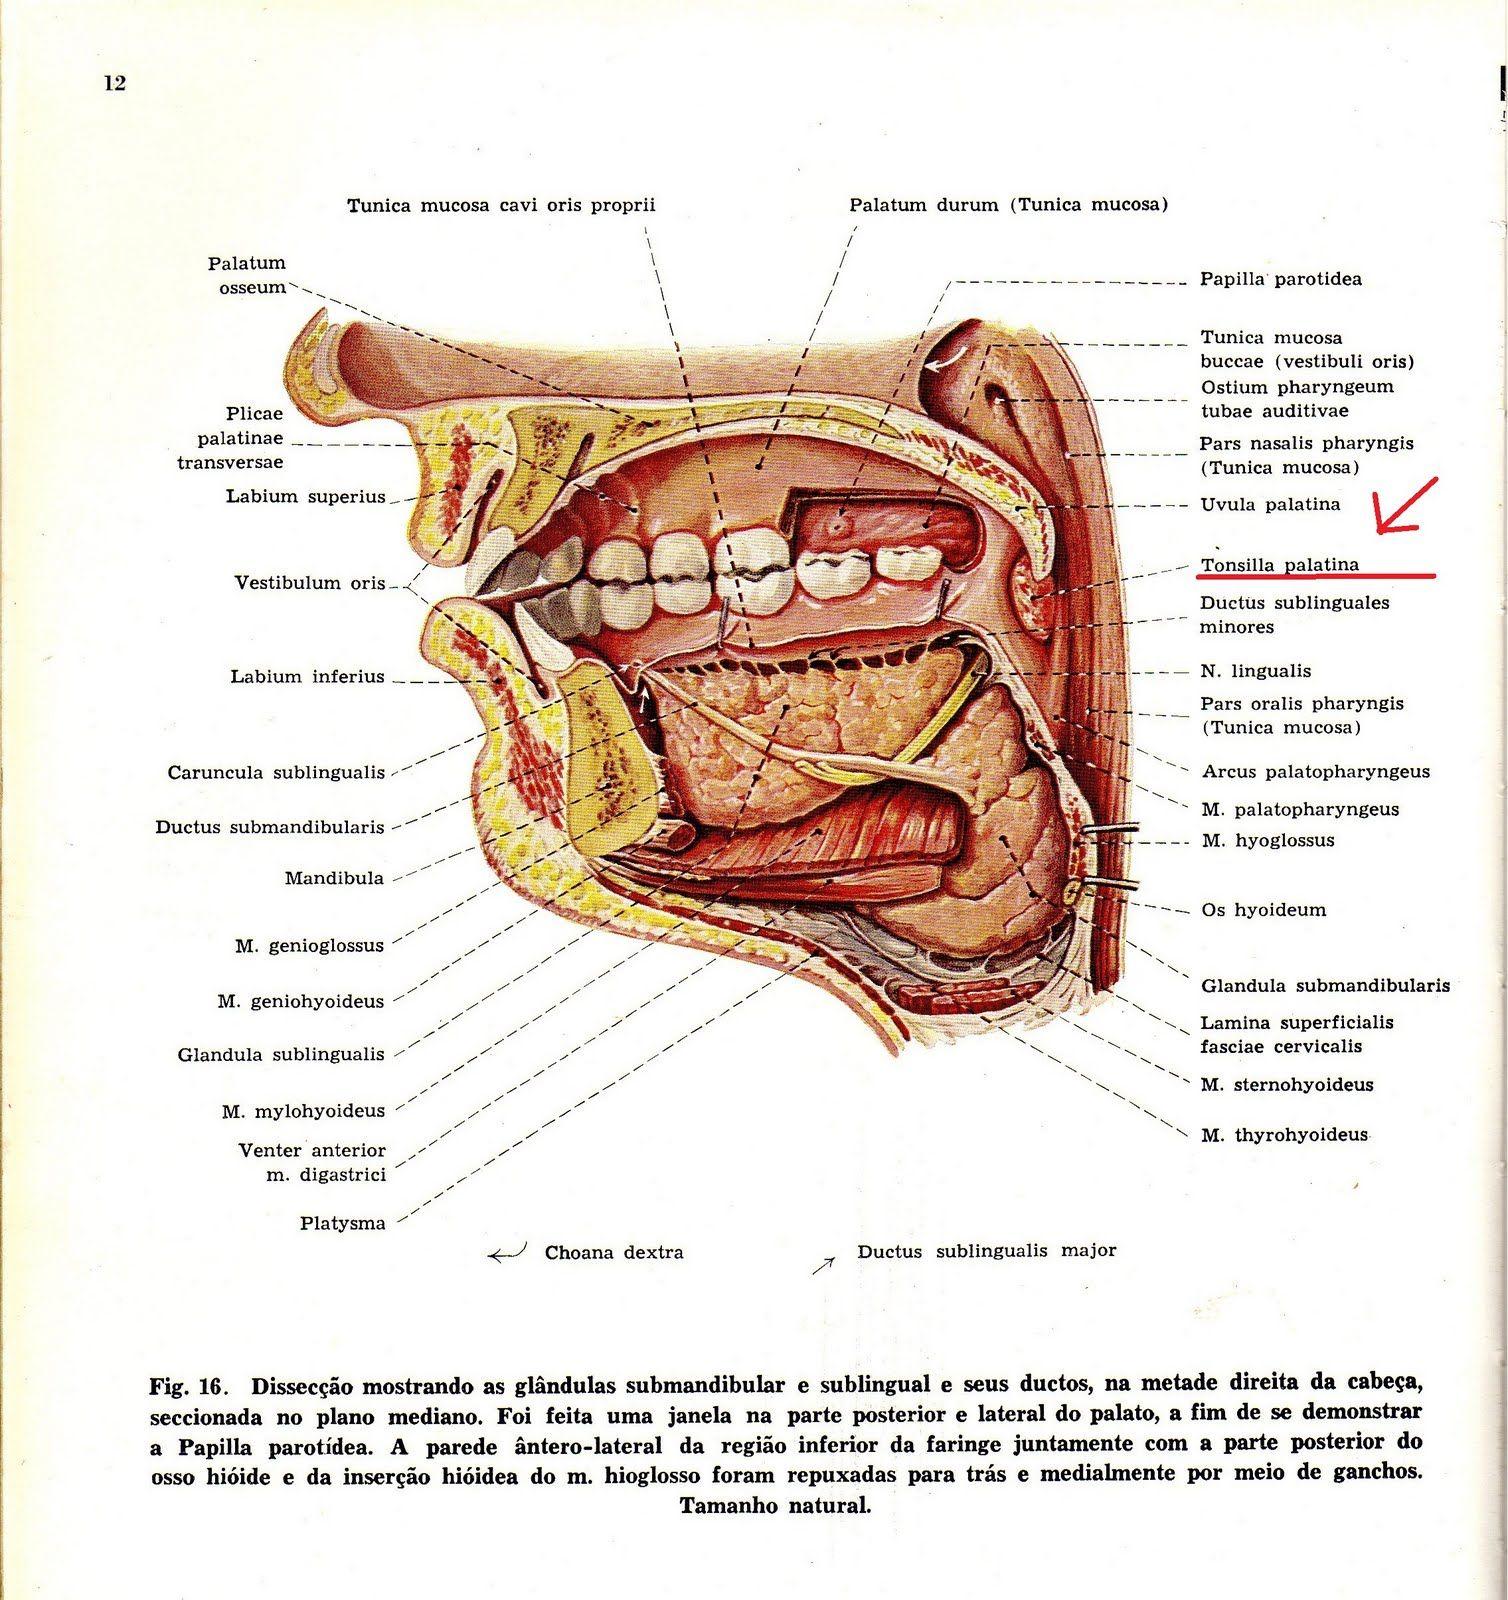 hight resolution of uvula palatina s k p google